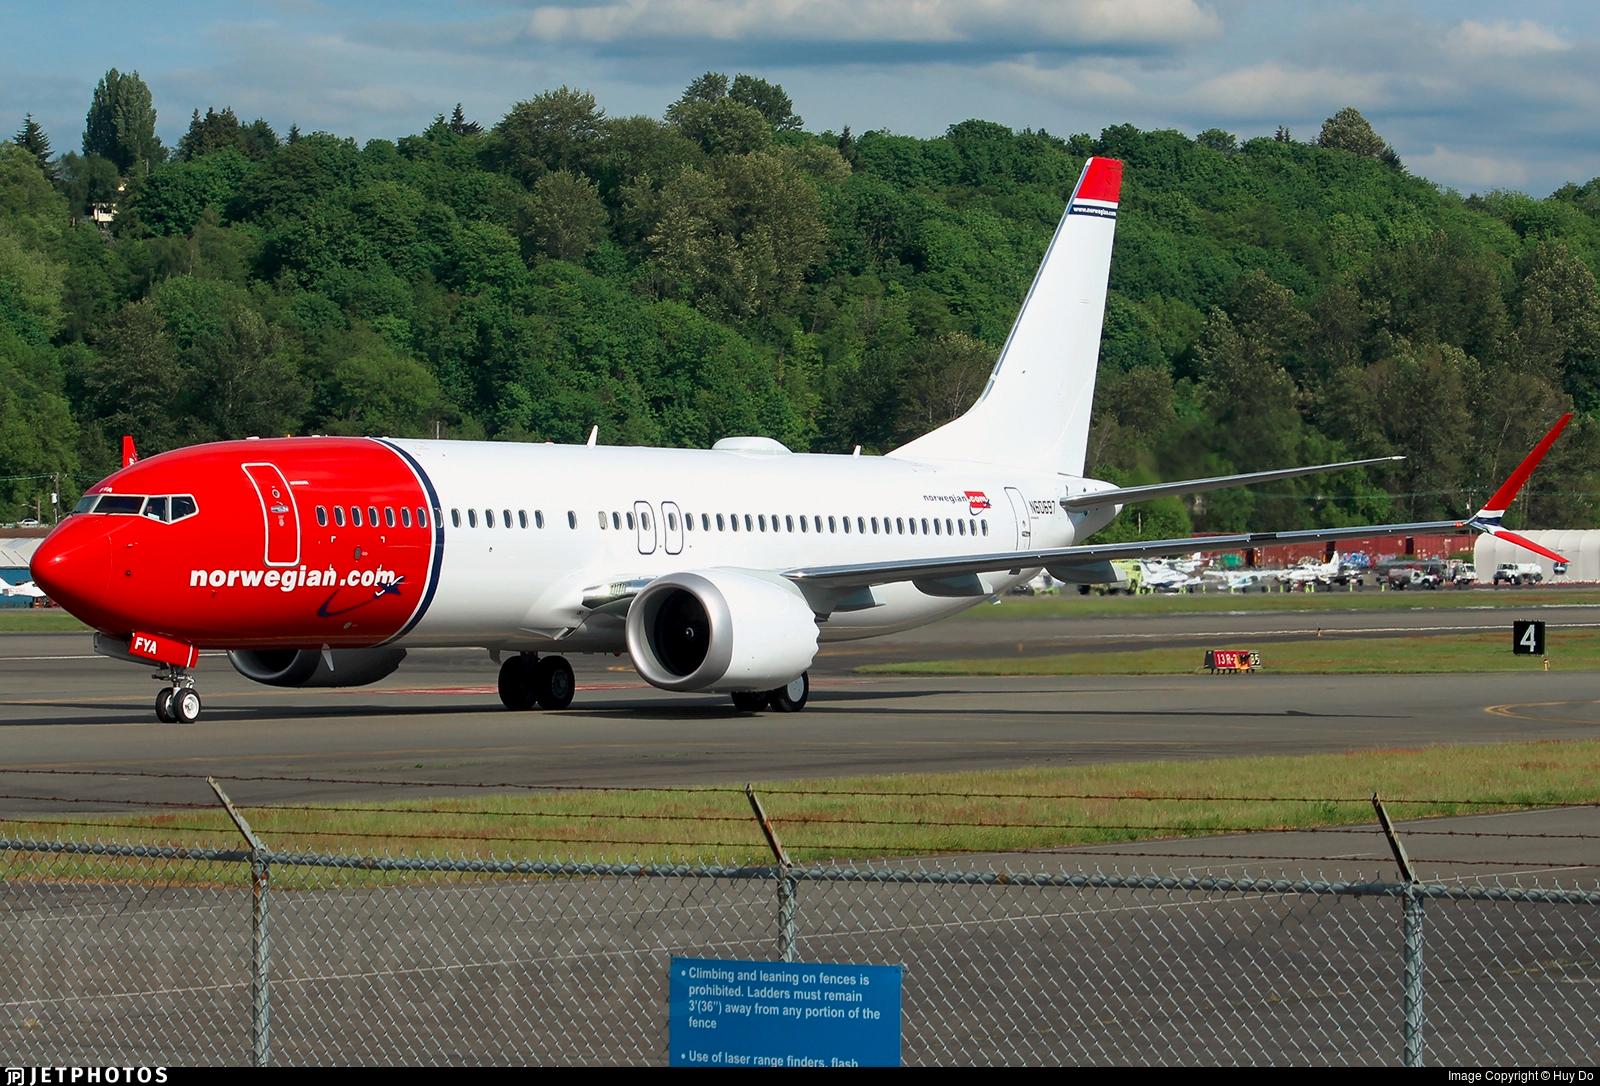 B60697 – Boeing 737 MAX8. King County International Airport-Boeing Field 19. maj 2017 (Foto: Huy Do)